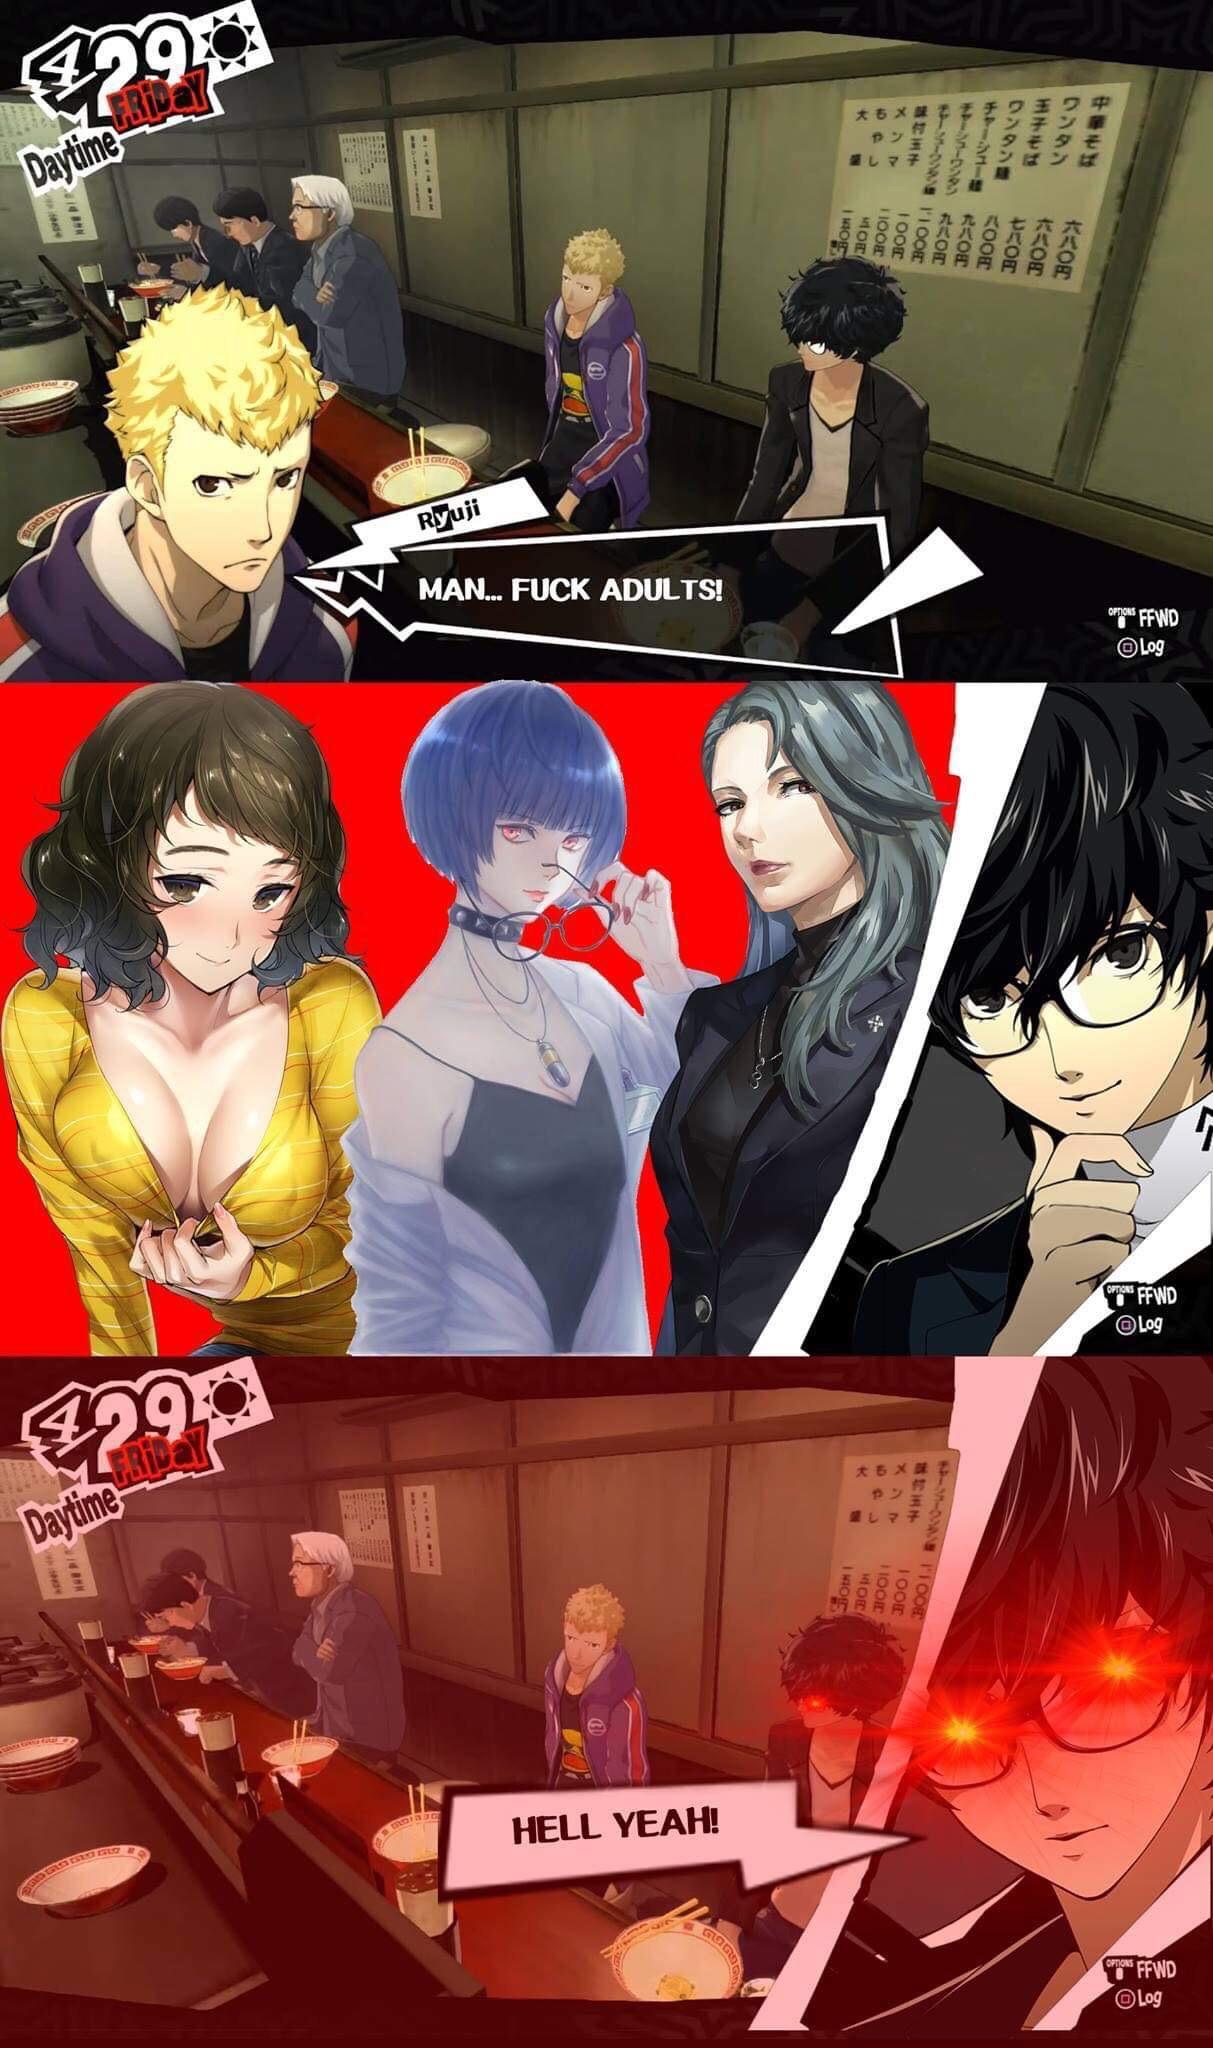 The Phantom Memes - Persona 5 Memes - Posts | Facebook